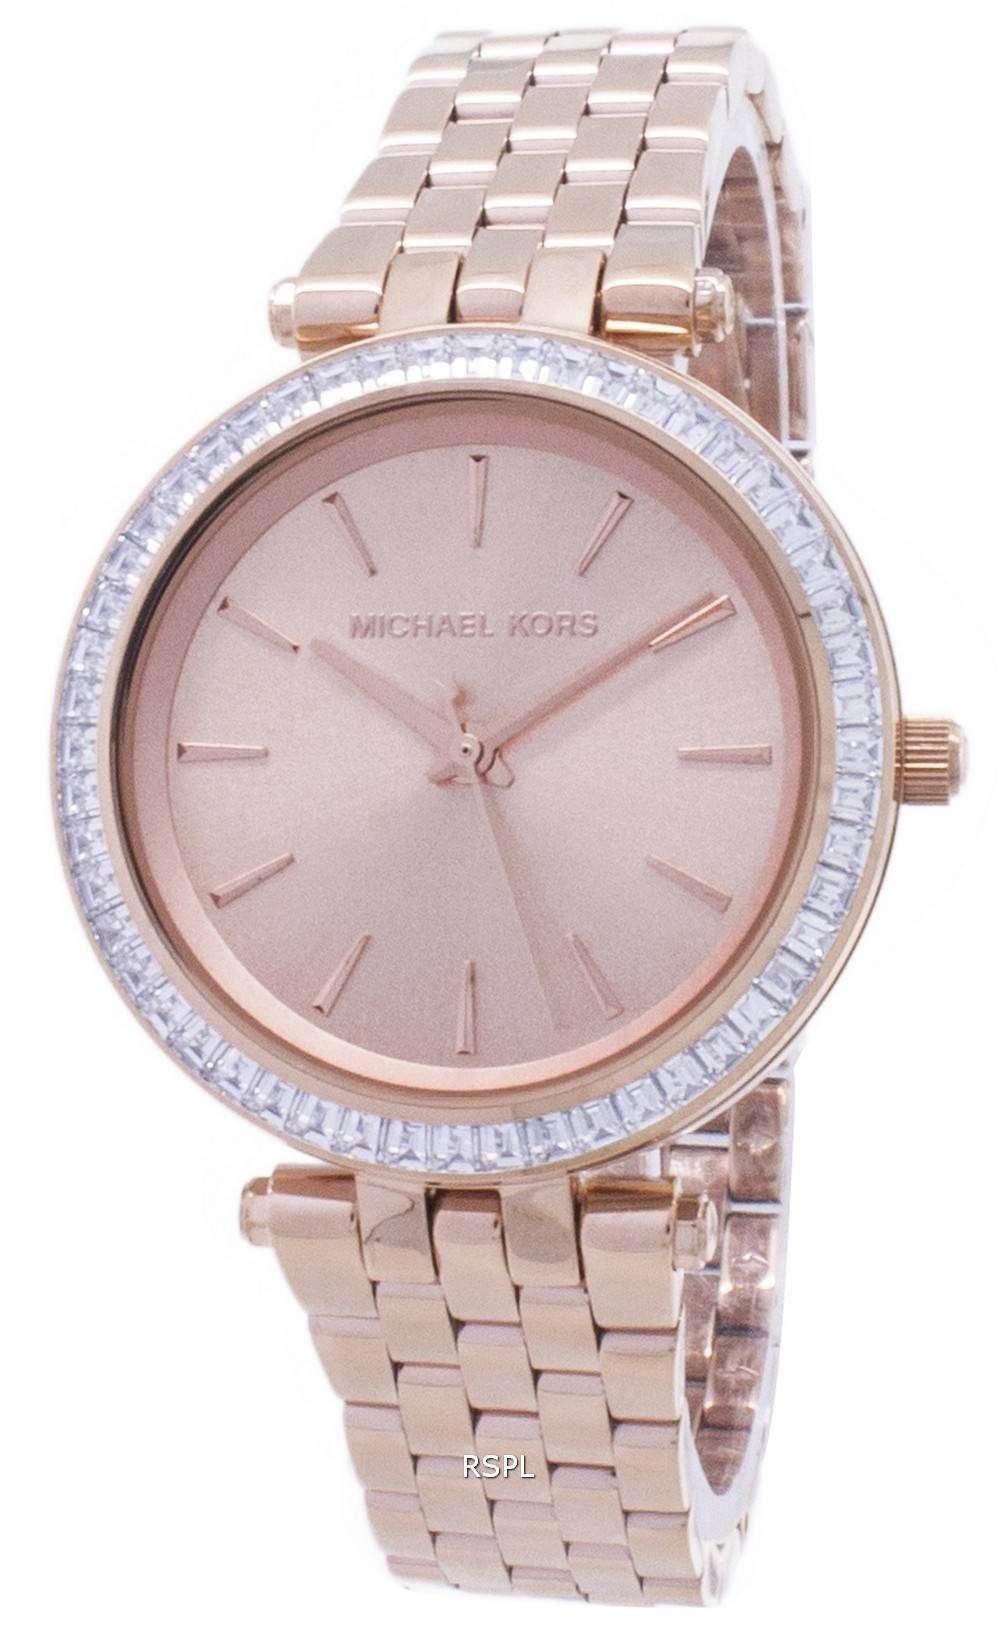 42a049ed8d8e Michael Kors Mini Darci Crystals Rose Gold Tone MK3366 Womens Watch